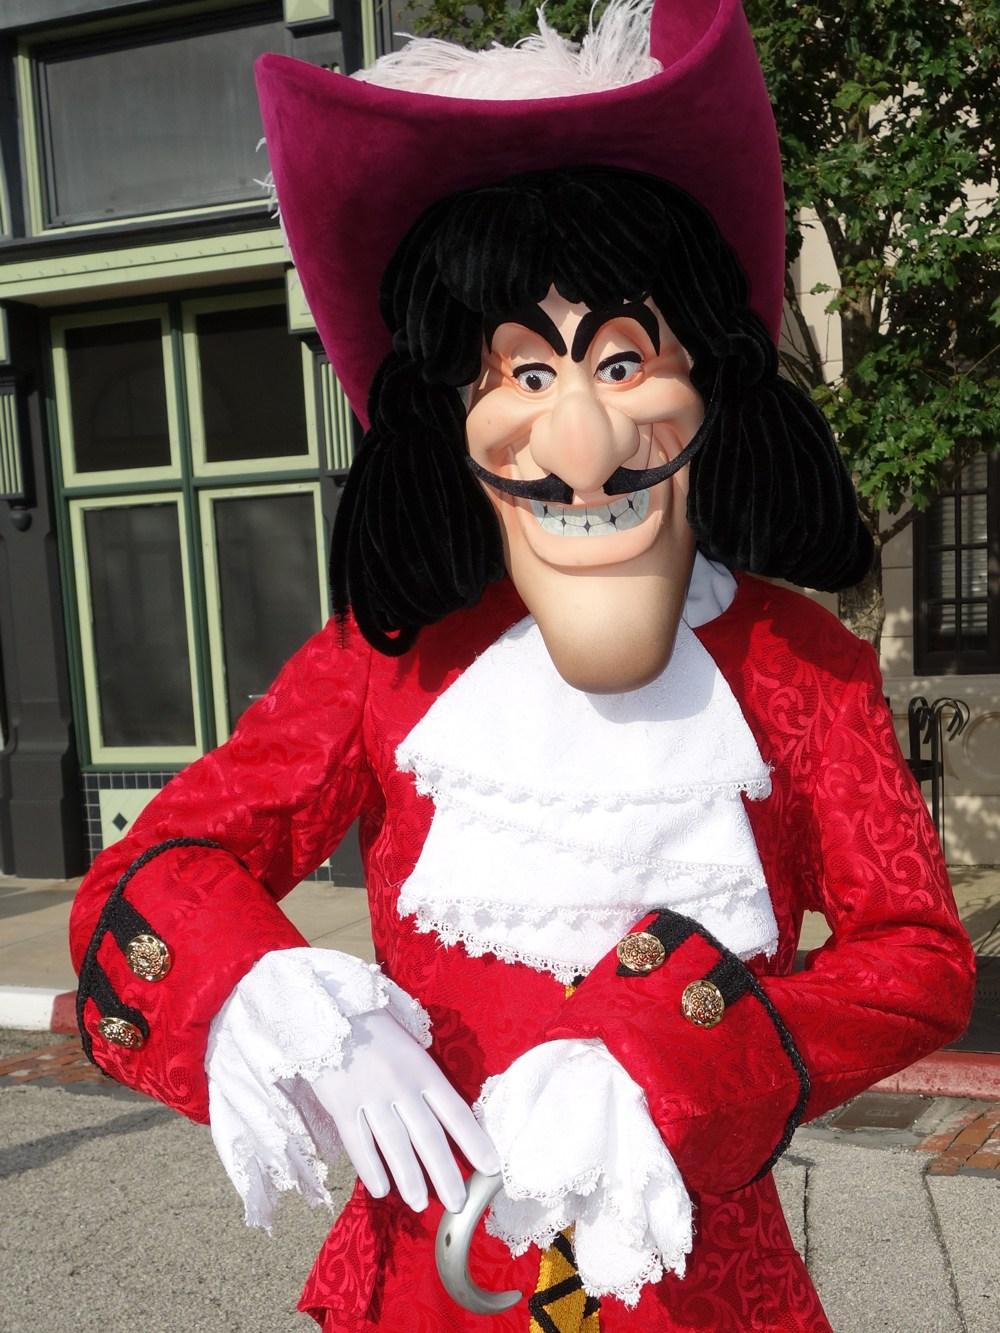 A Pirate themed trip to Walt Disney World.